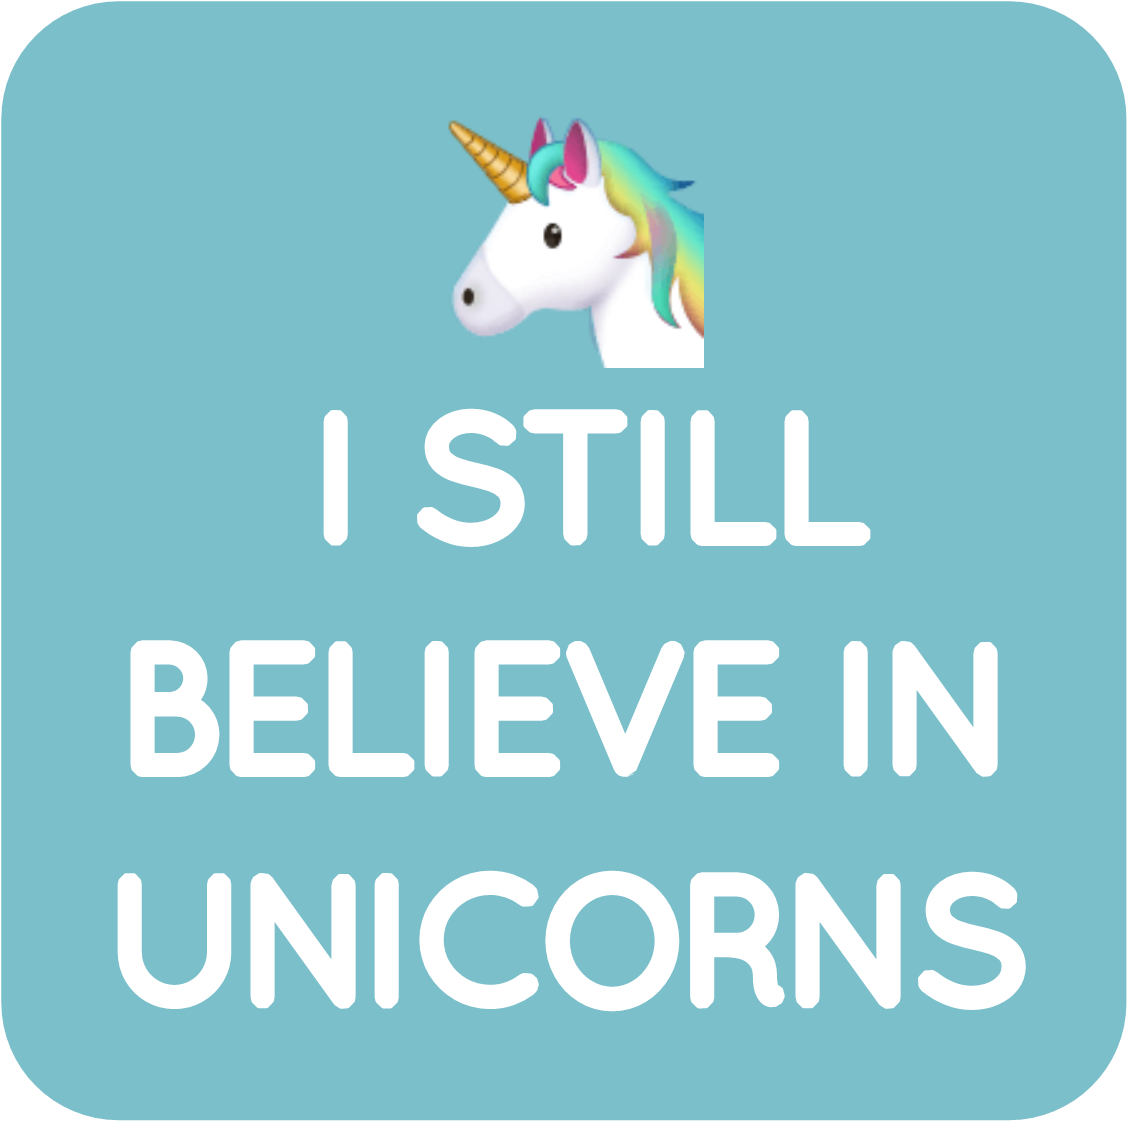 08-I still believe in unicorns.png